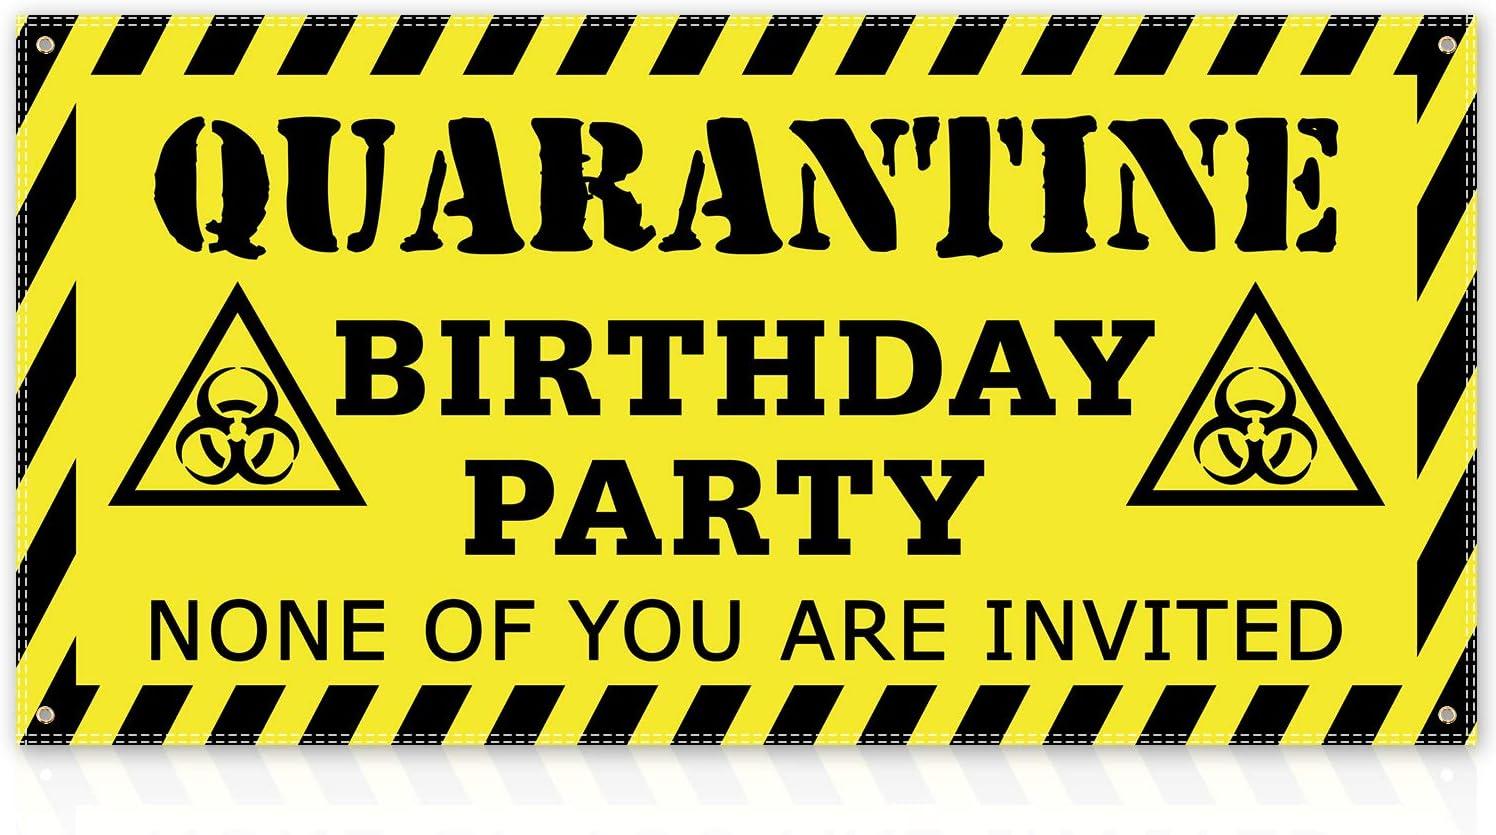 Quarantine Birthday Party Quarantine Party Sign Quarantine Graduation Banner Quarantine Birthday Banner Quarantine Party